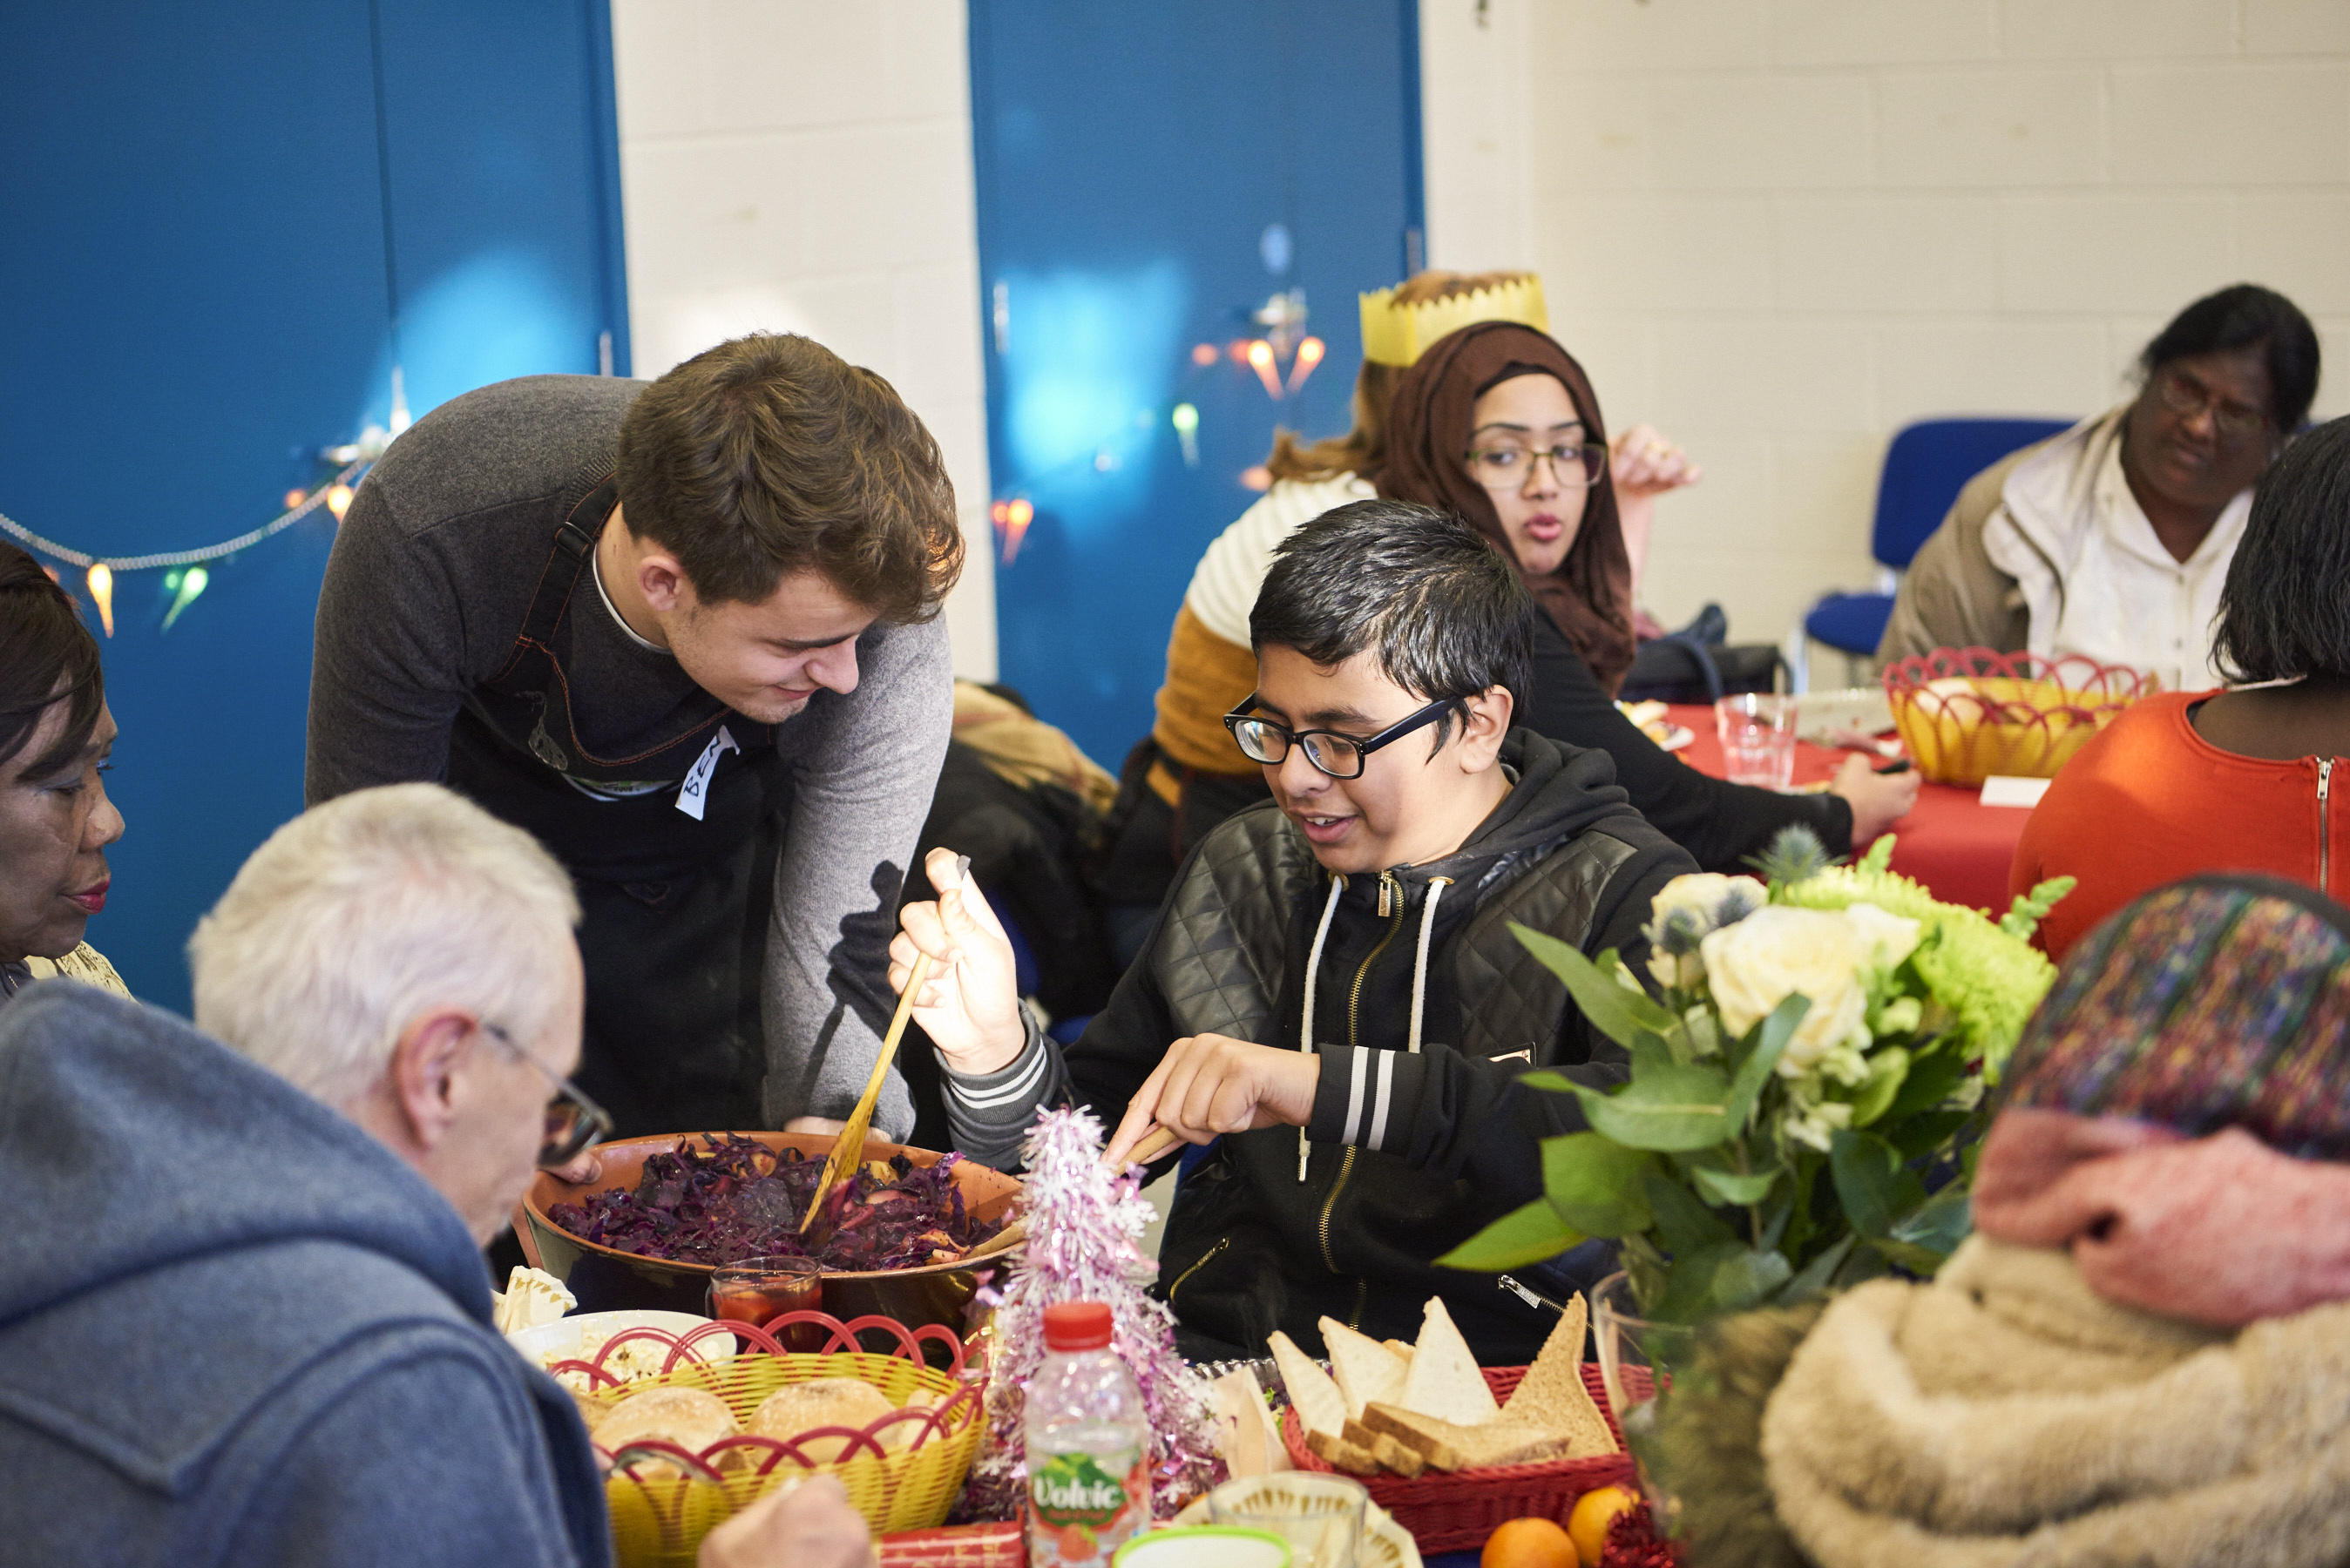 Uniting and nourishing people on the breadline